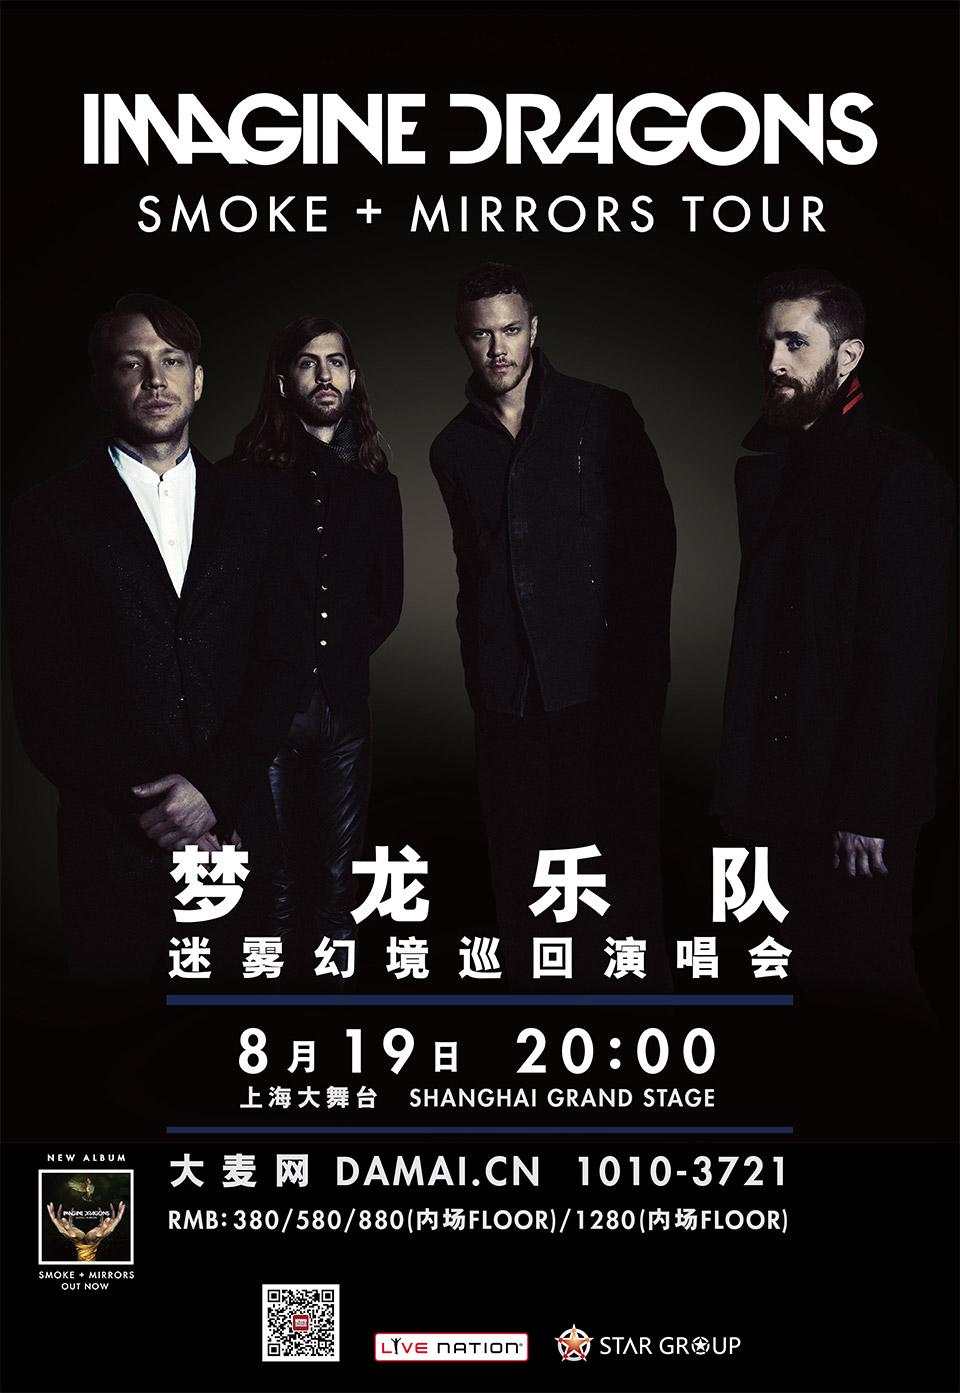 imagine-dragons-shanghai-live-2015-poster